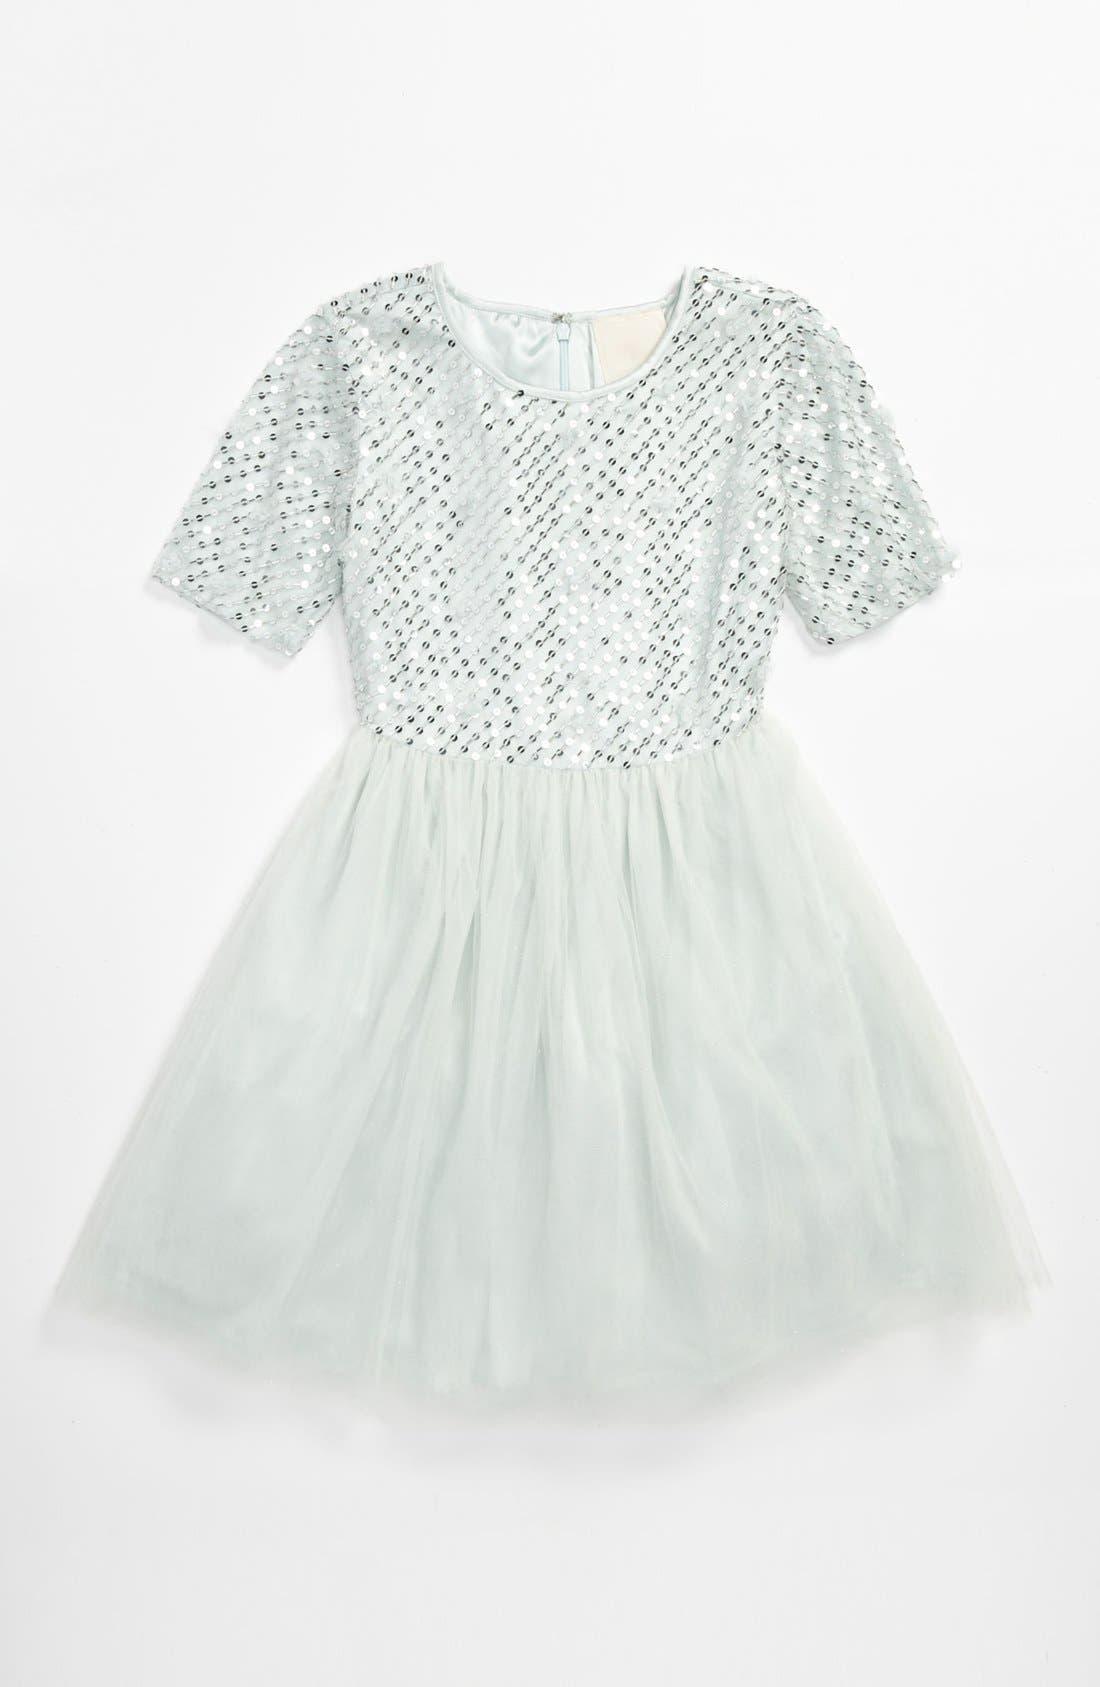 Main Image - La Piccola Danza Kidswear Elbow Sleeve Beaded Dress (Big Girls)